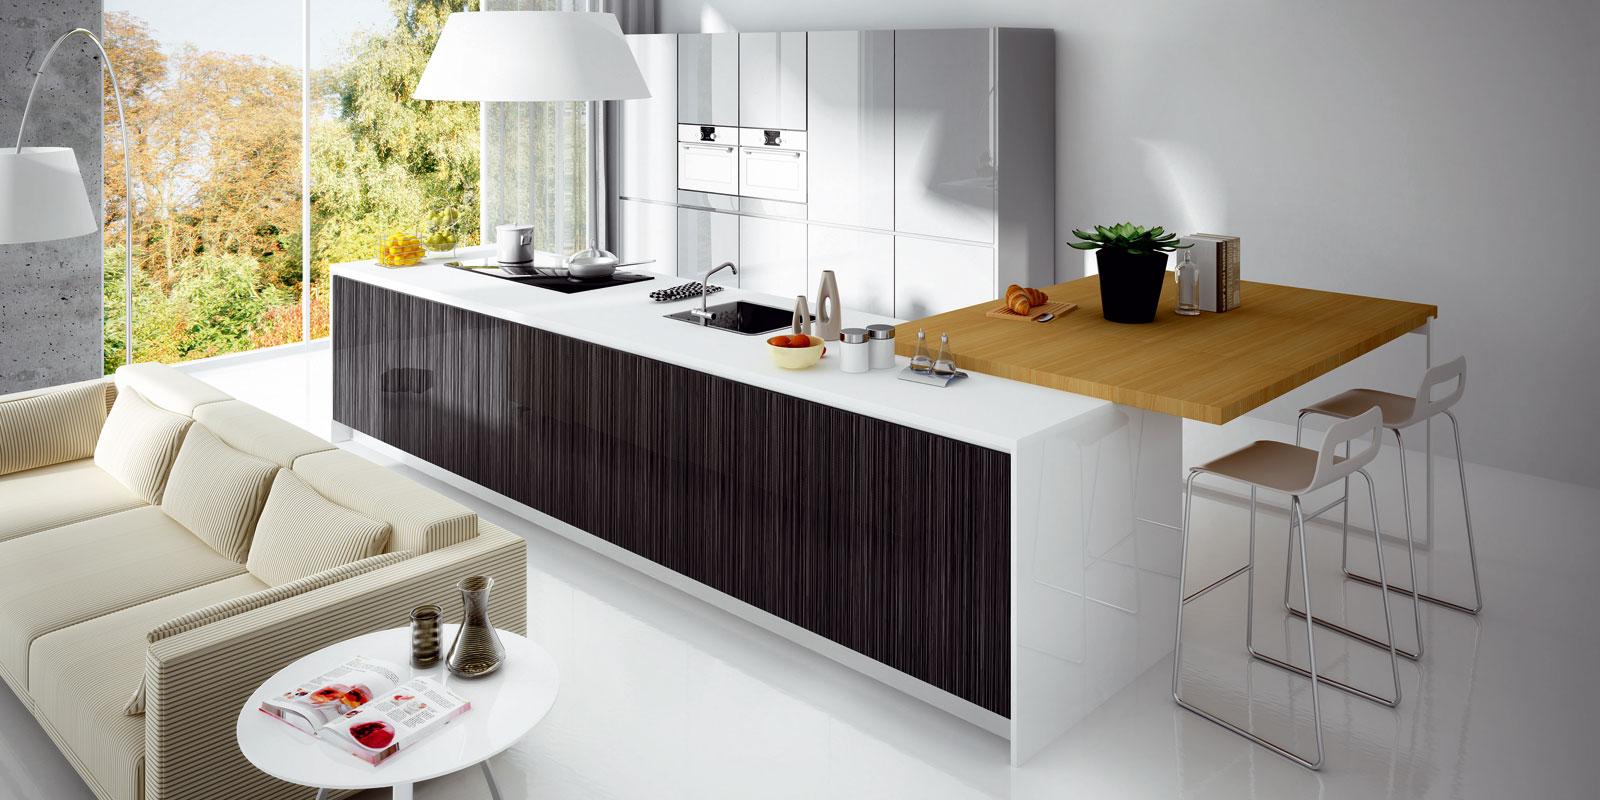 Alvic muebles de cocina las palmas dicerma pavimentos - Bano barato las palmas ...